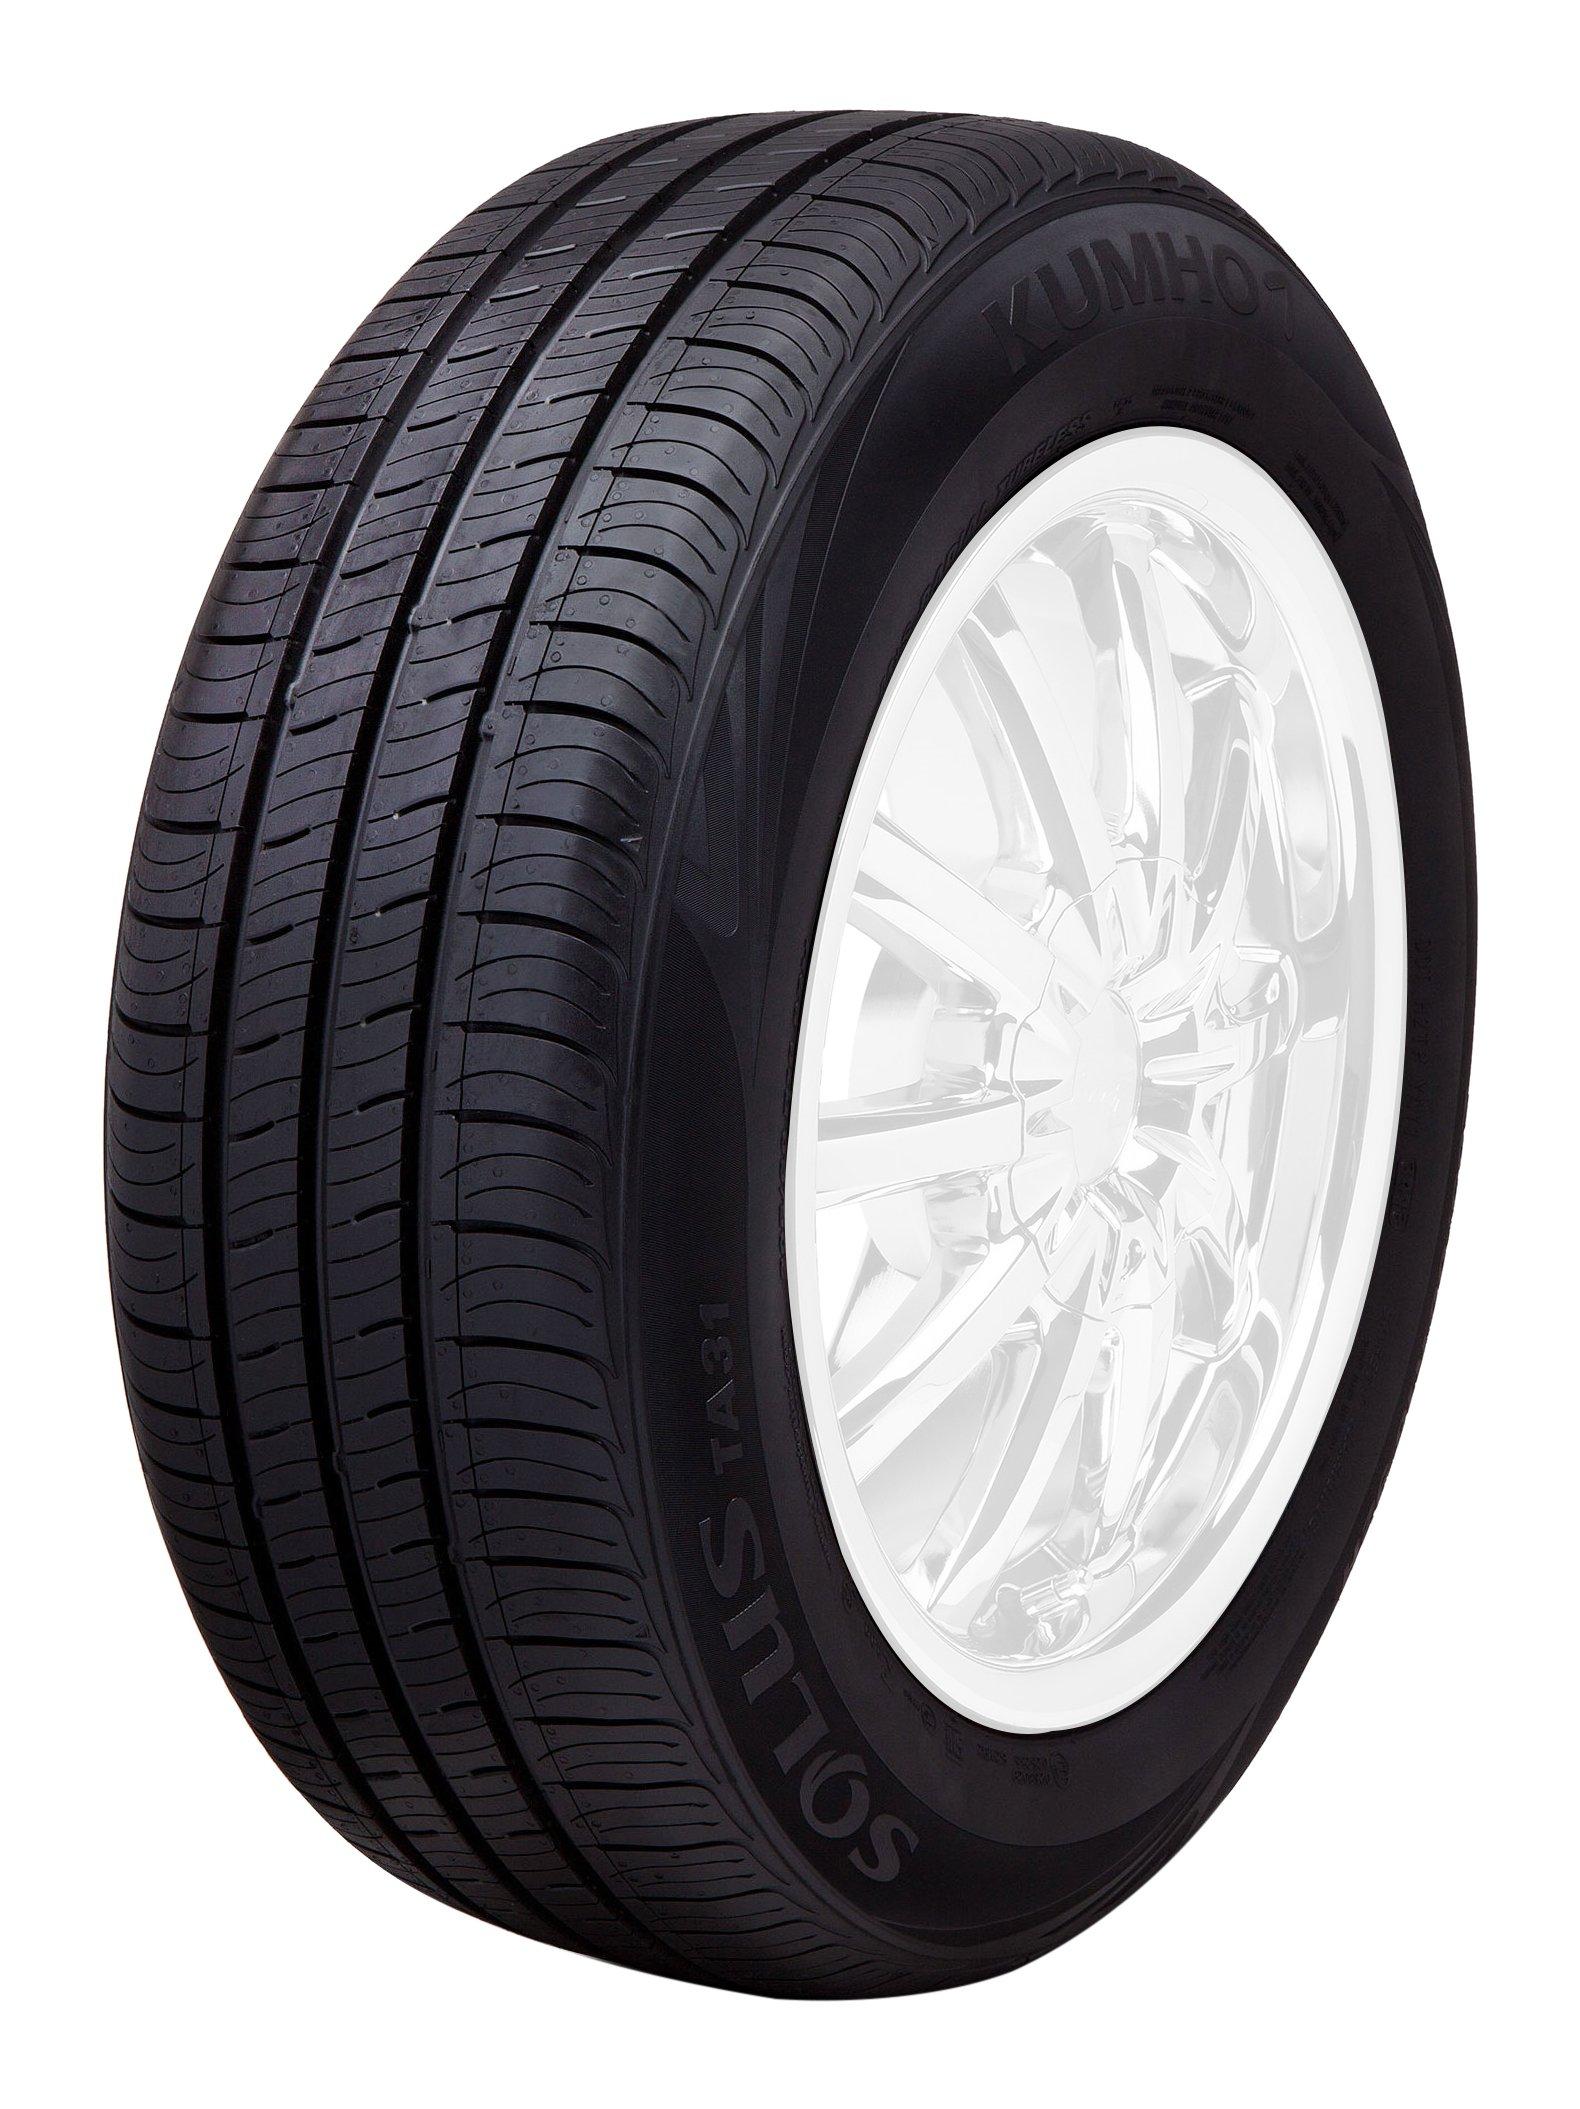 Kumho Solus TA31 Performance Radial Tire - 235/55R16 98V by Kumho (Image #1)